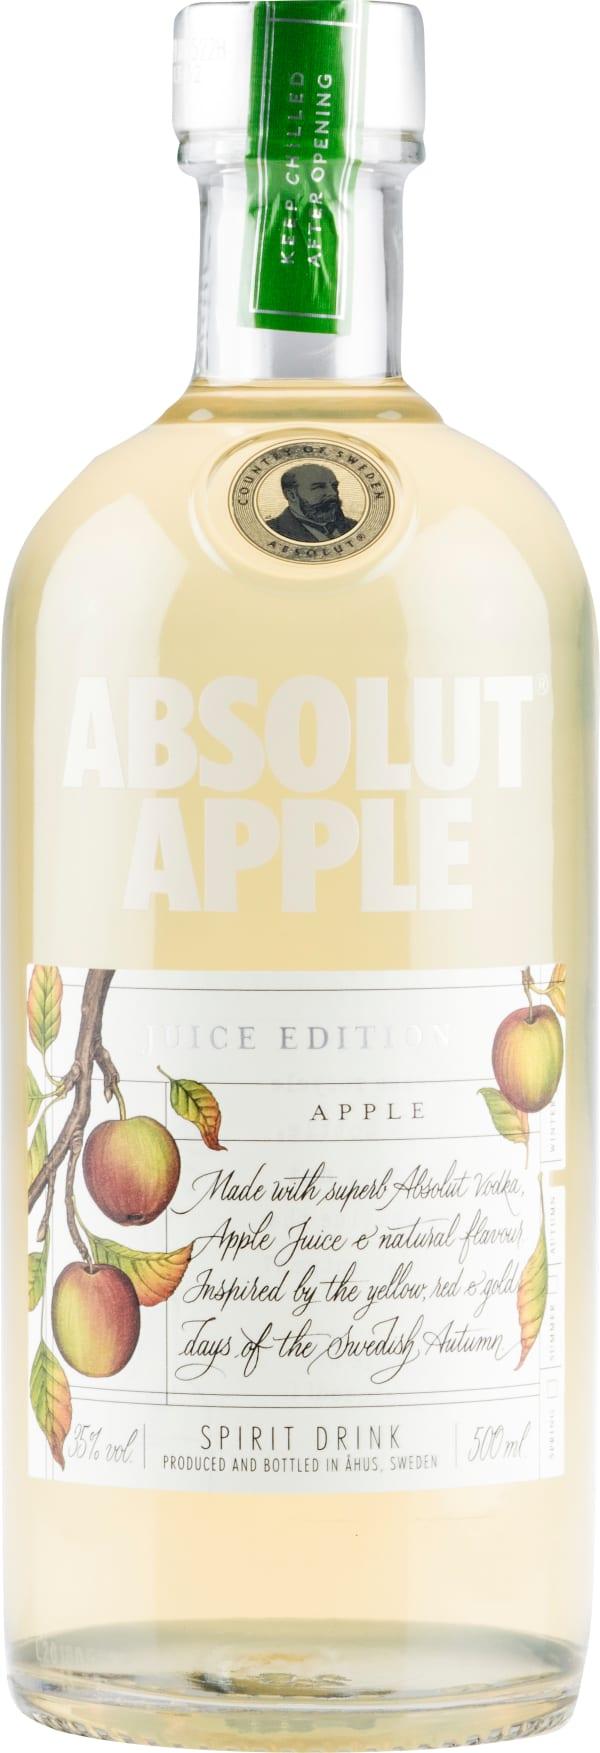 Absolut Juice Edition Apple